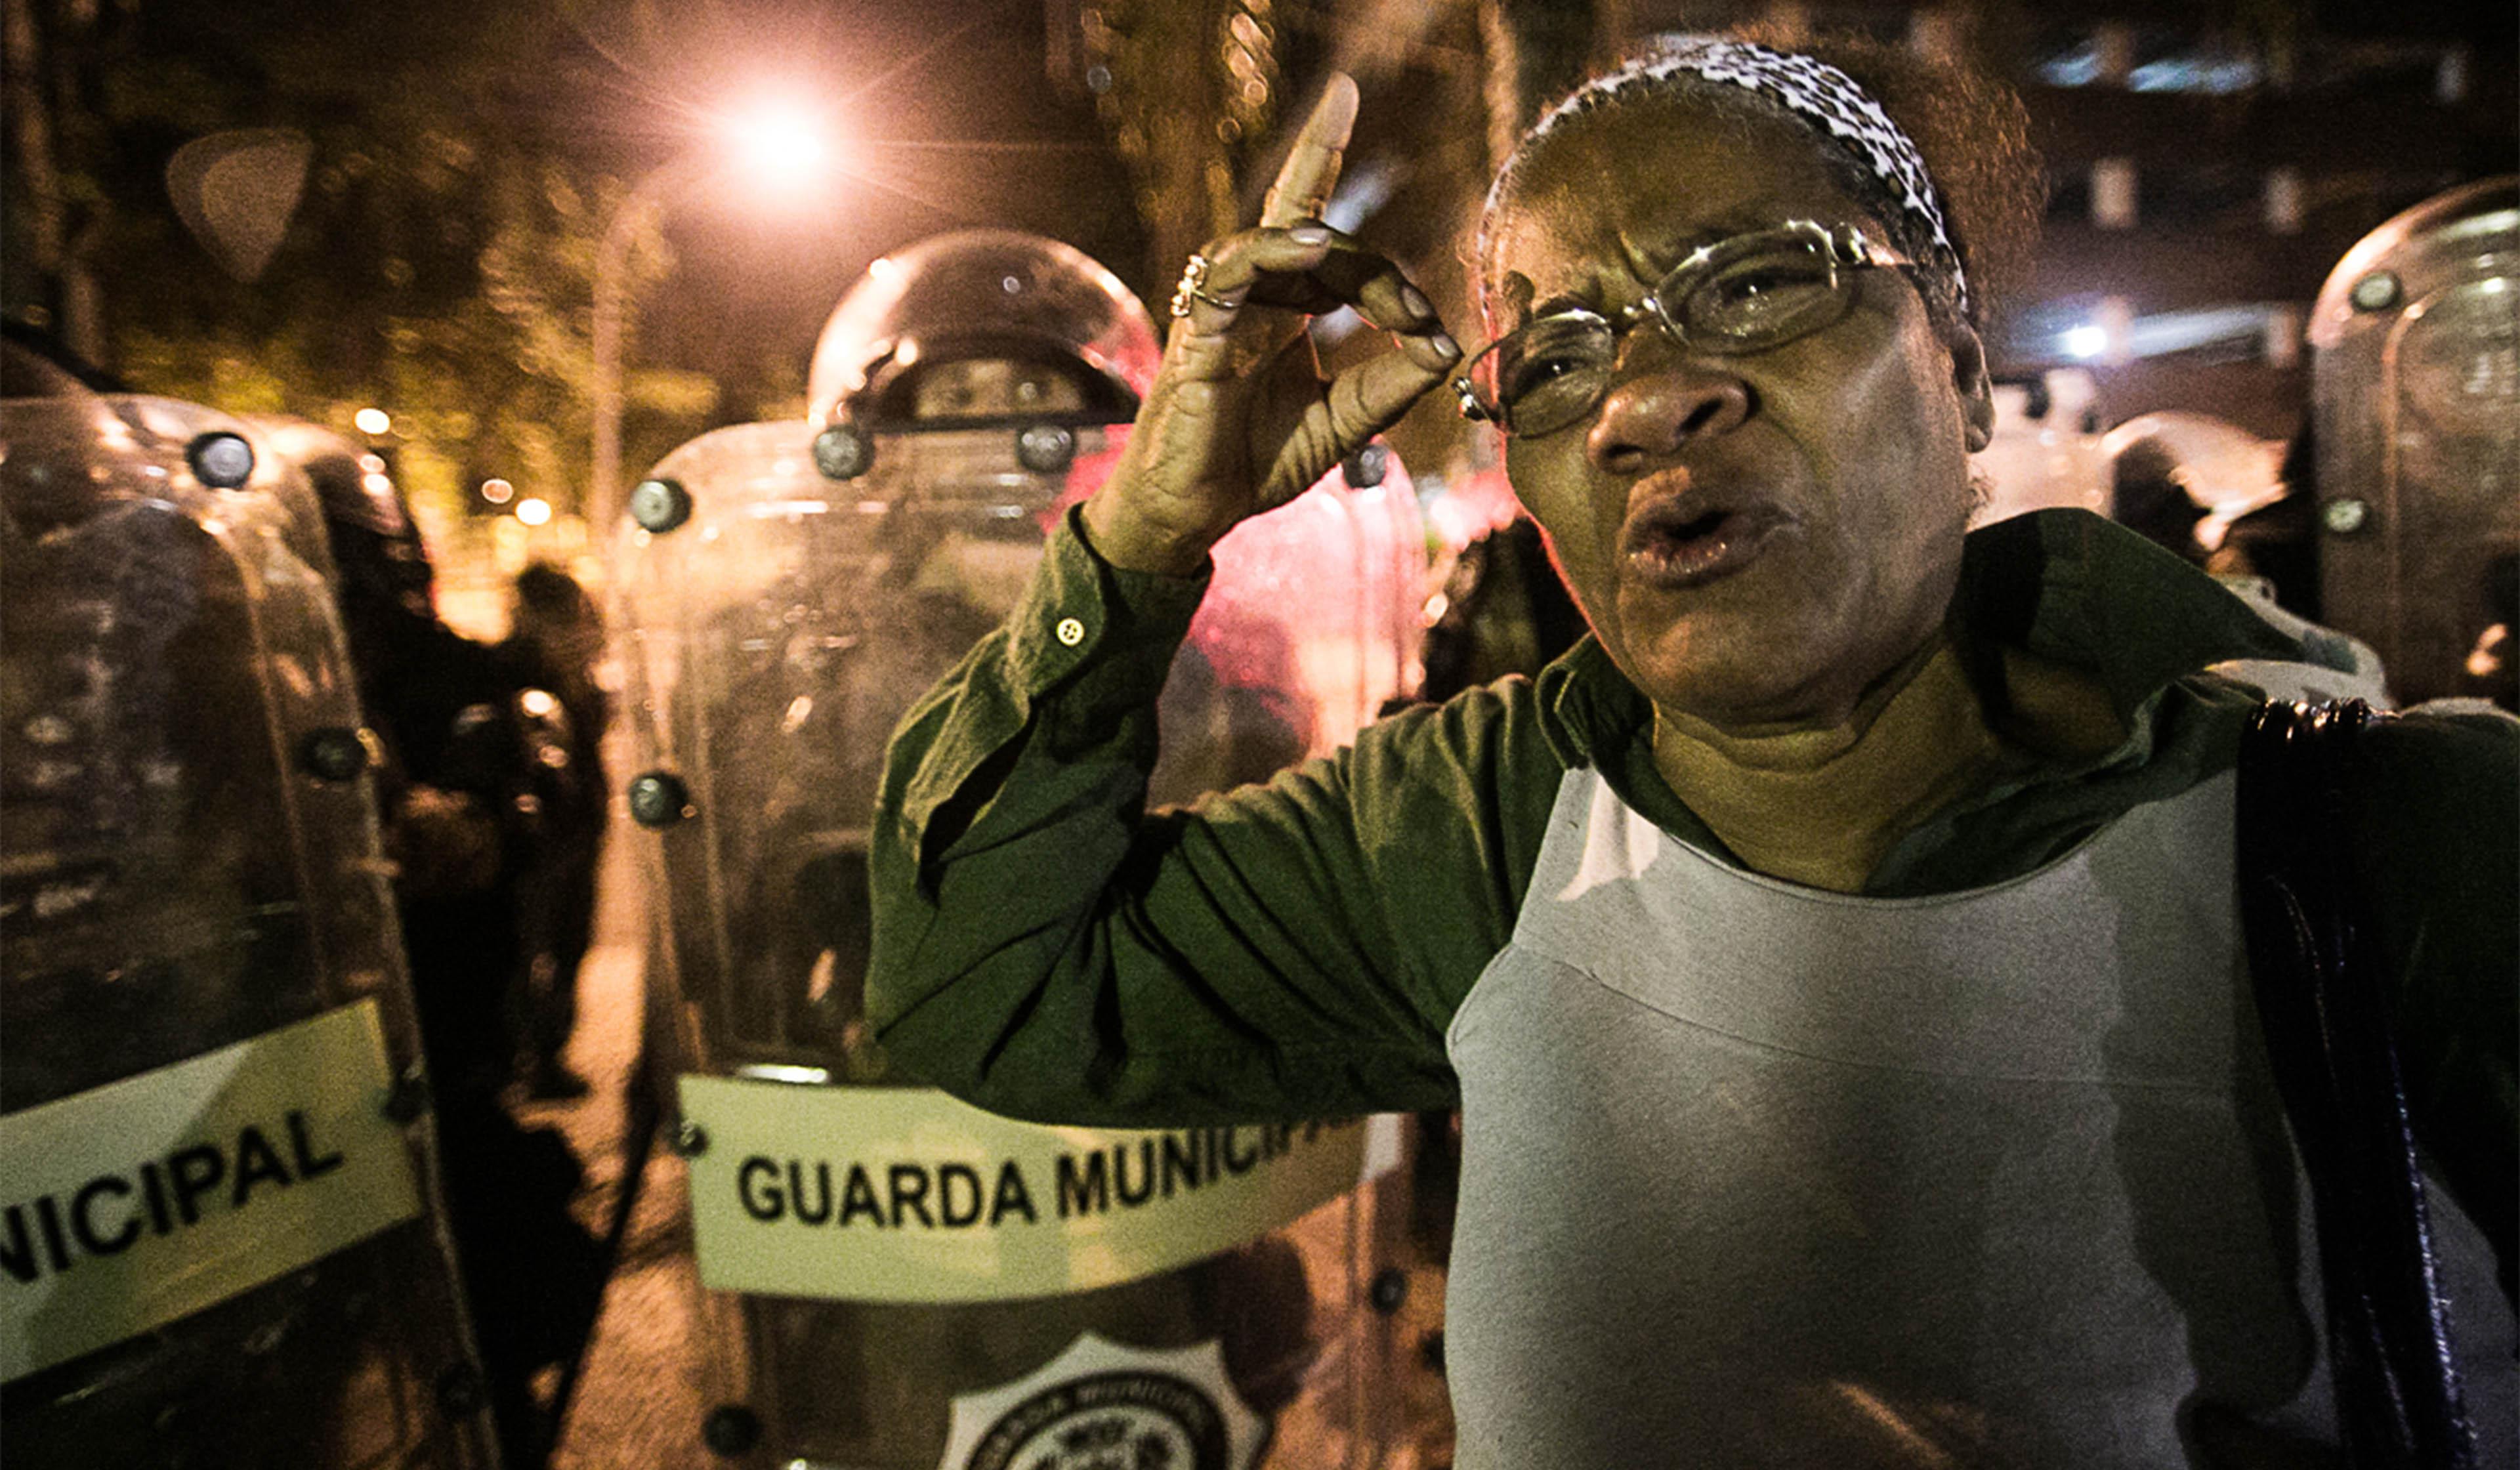 Photo from Mídia Ninja protest coverage